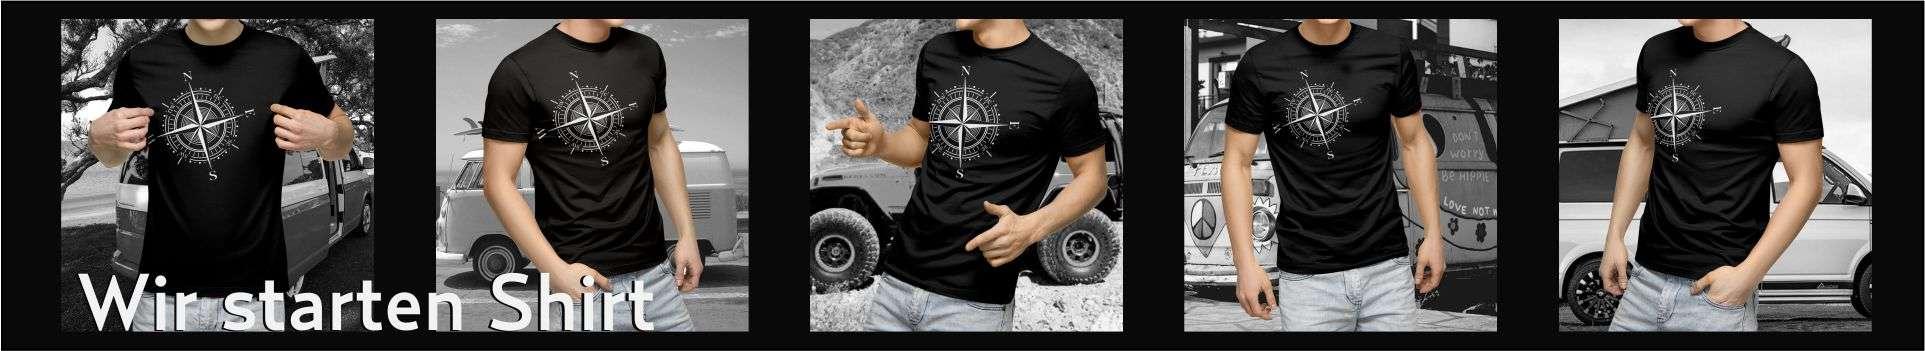 Windrose-shirt